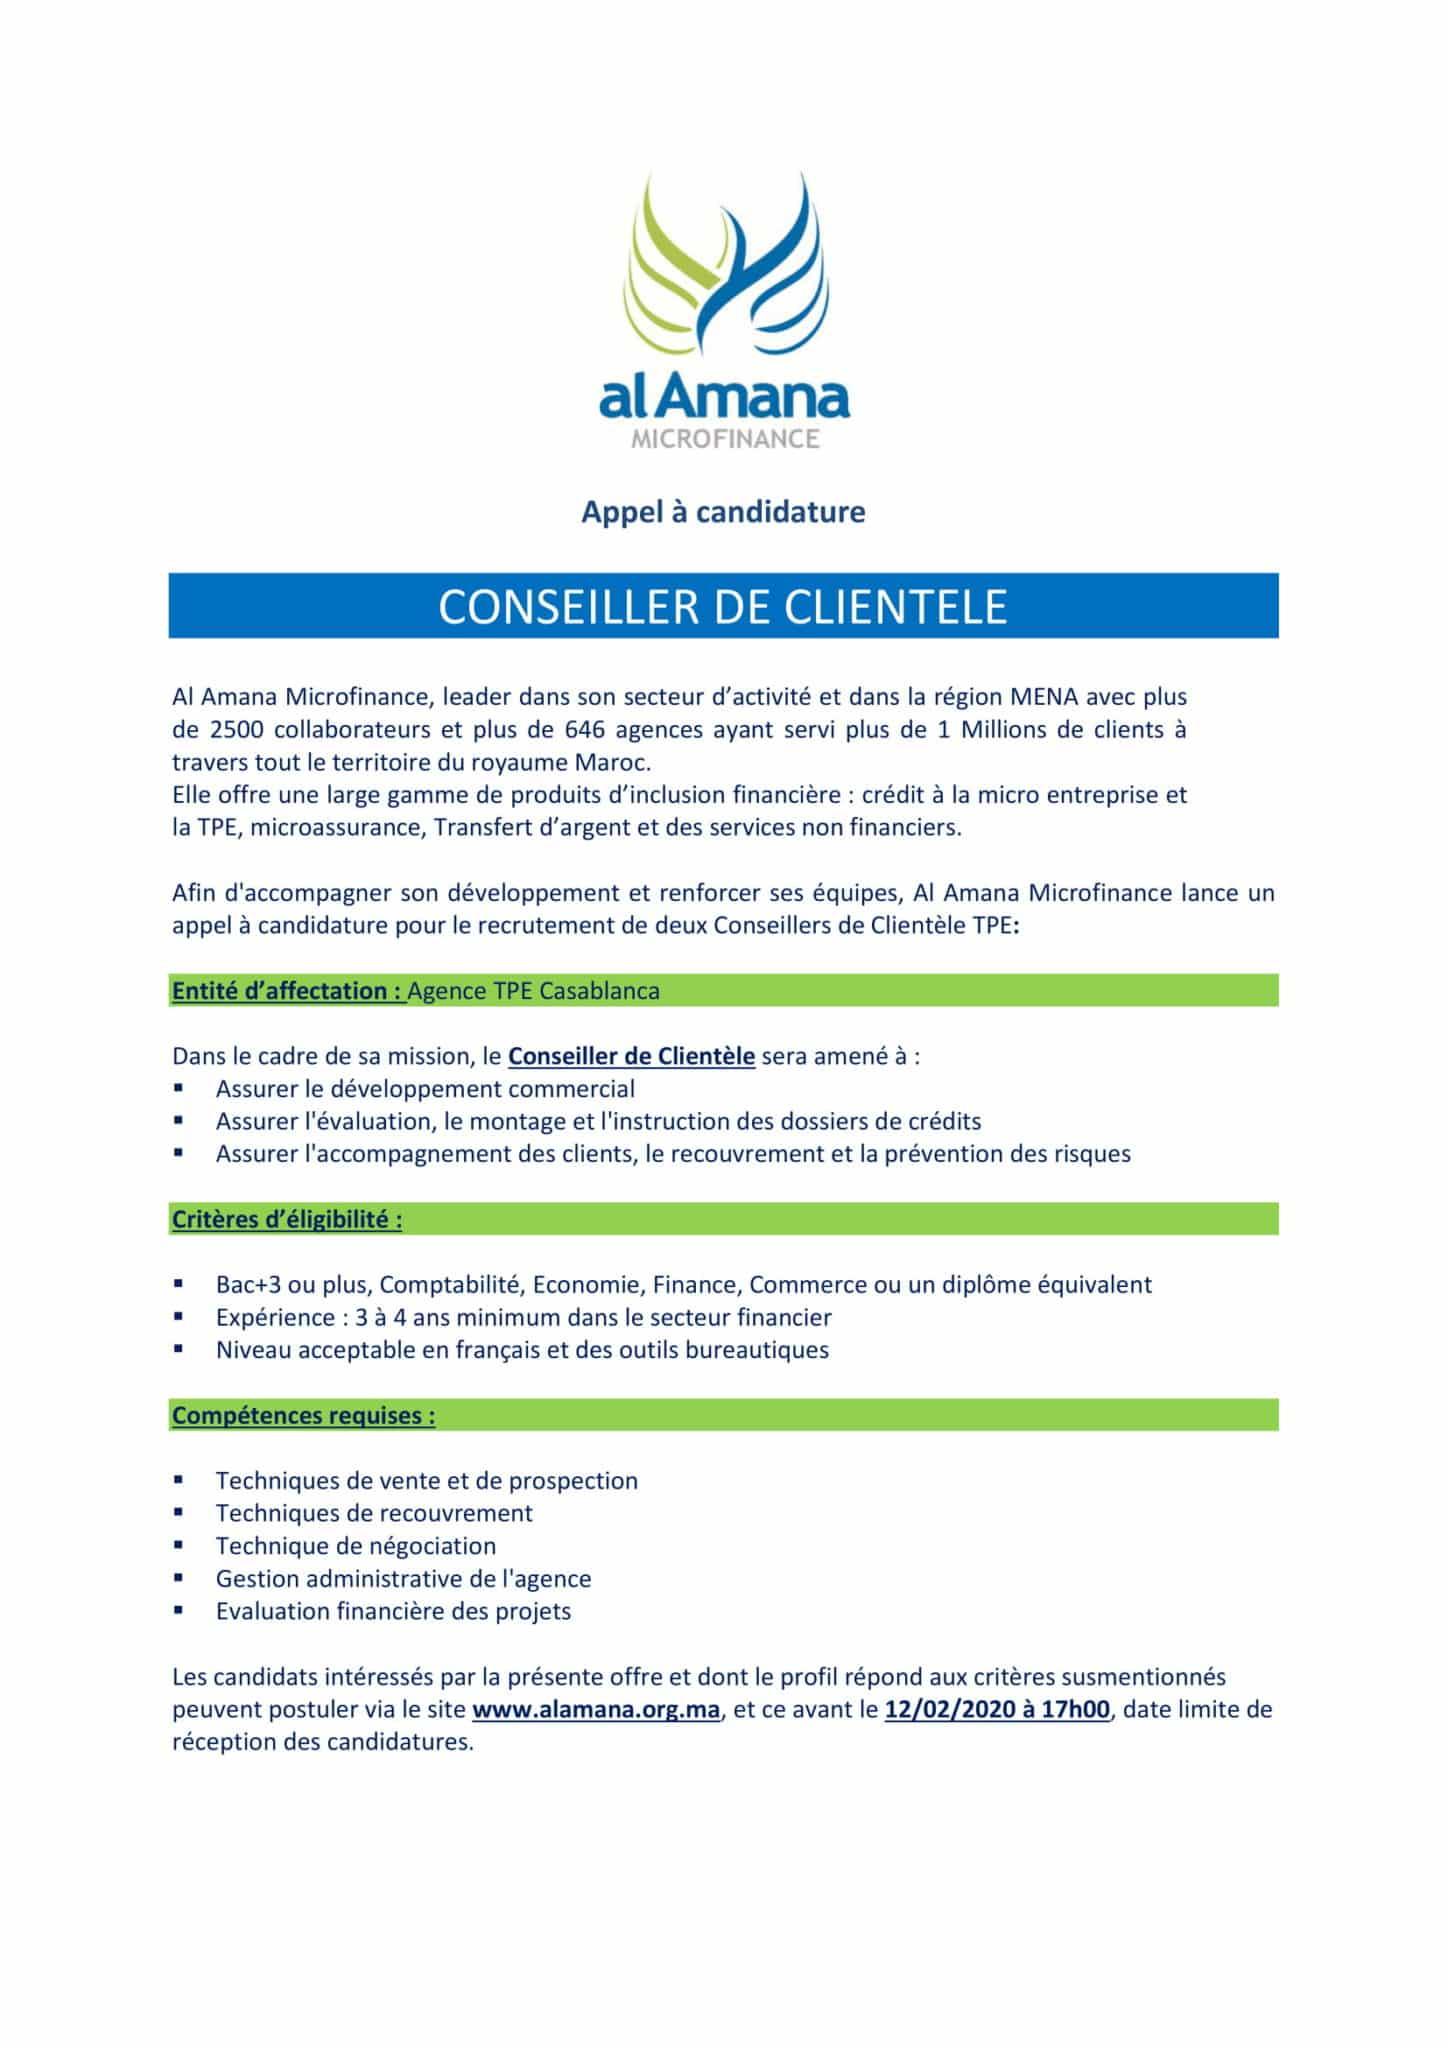 al-amana-microfinance-recrute- maroc-alwadifa.com